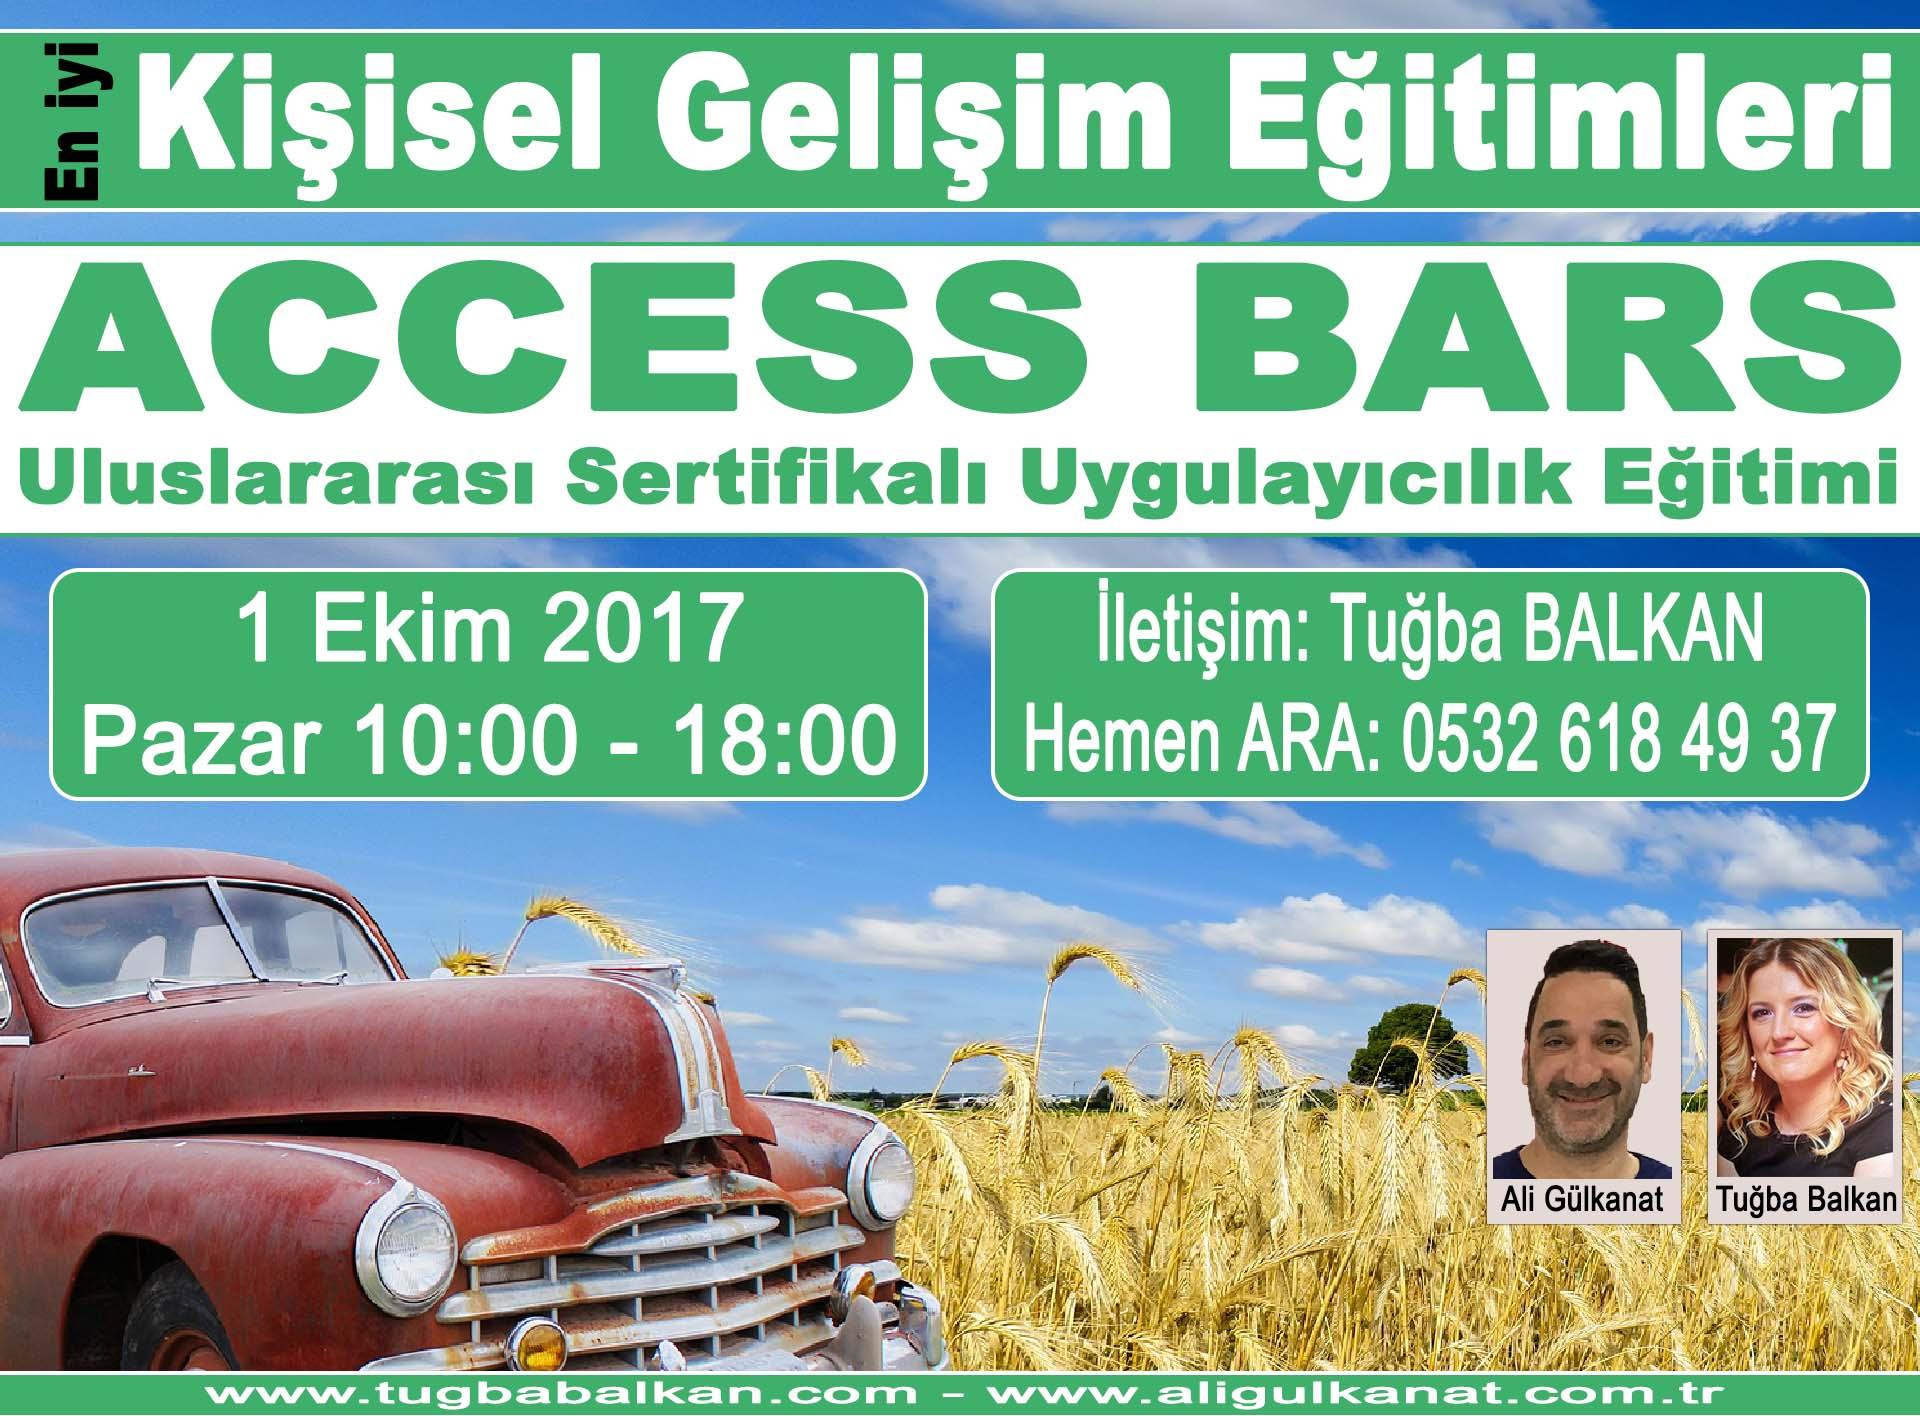 access-bars-tanitim-1-ekim-1